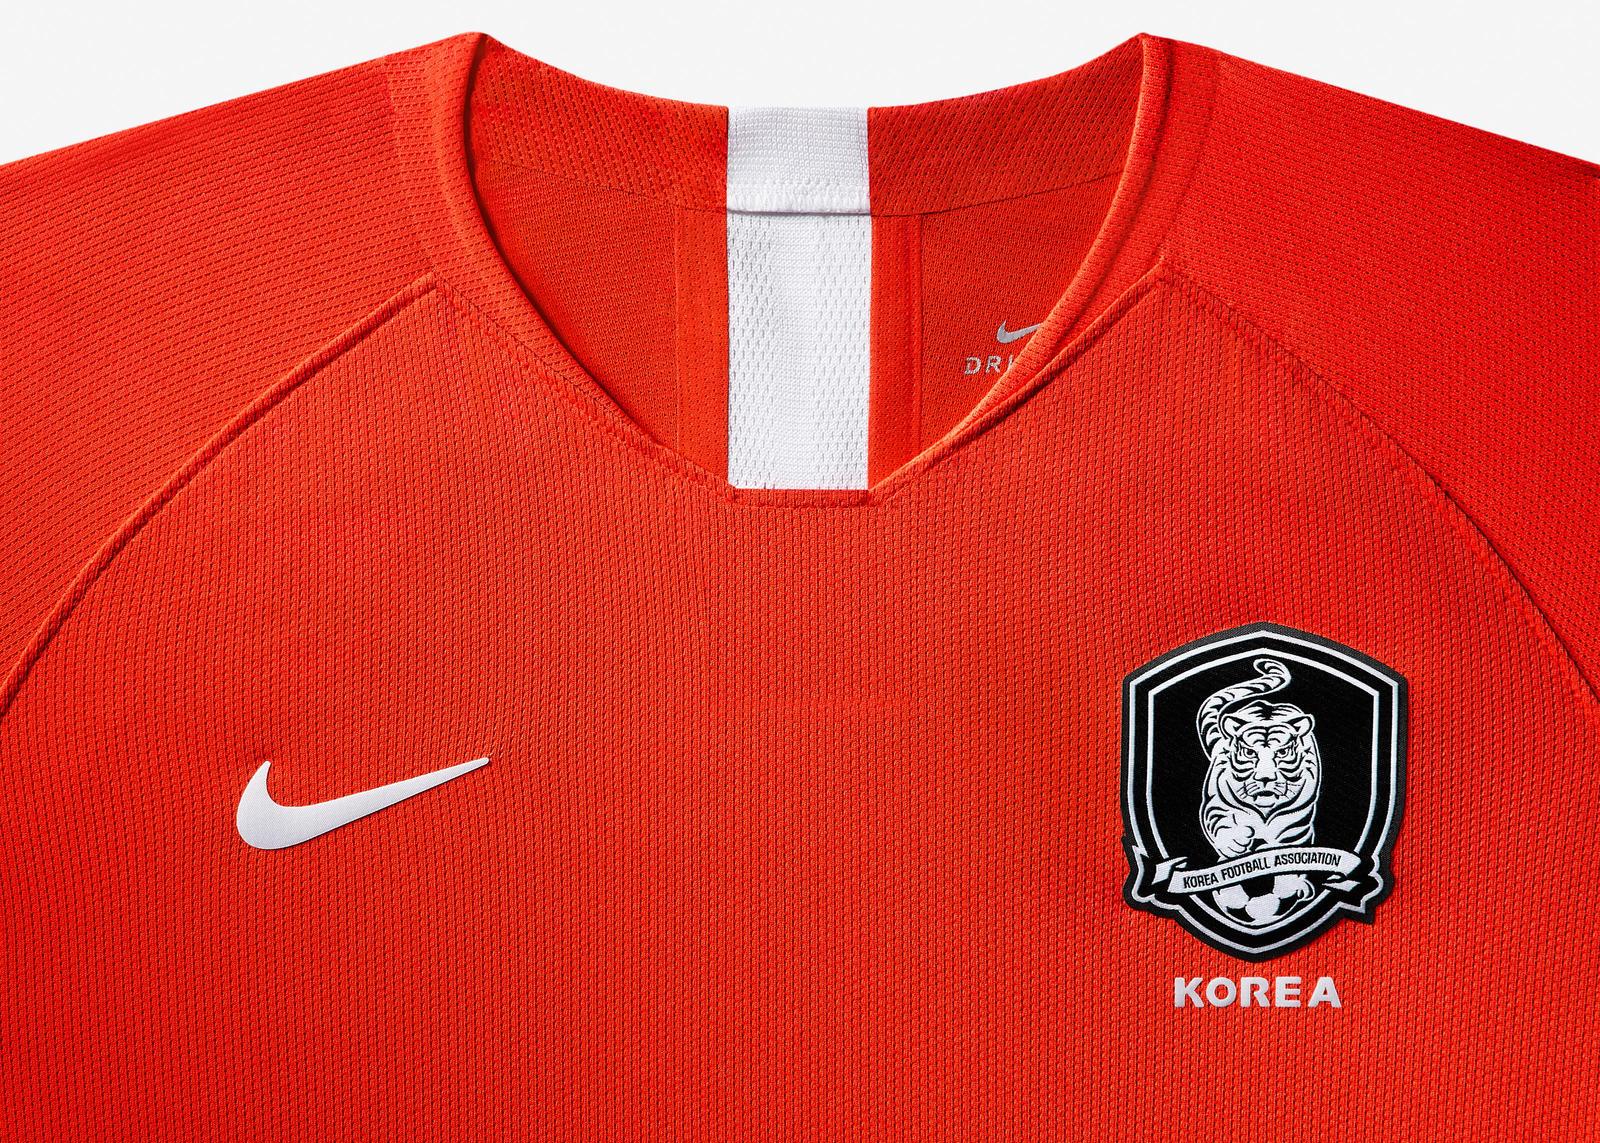 809d5d0ba87 South Korean 2019 Women s Football Kit - Nike News